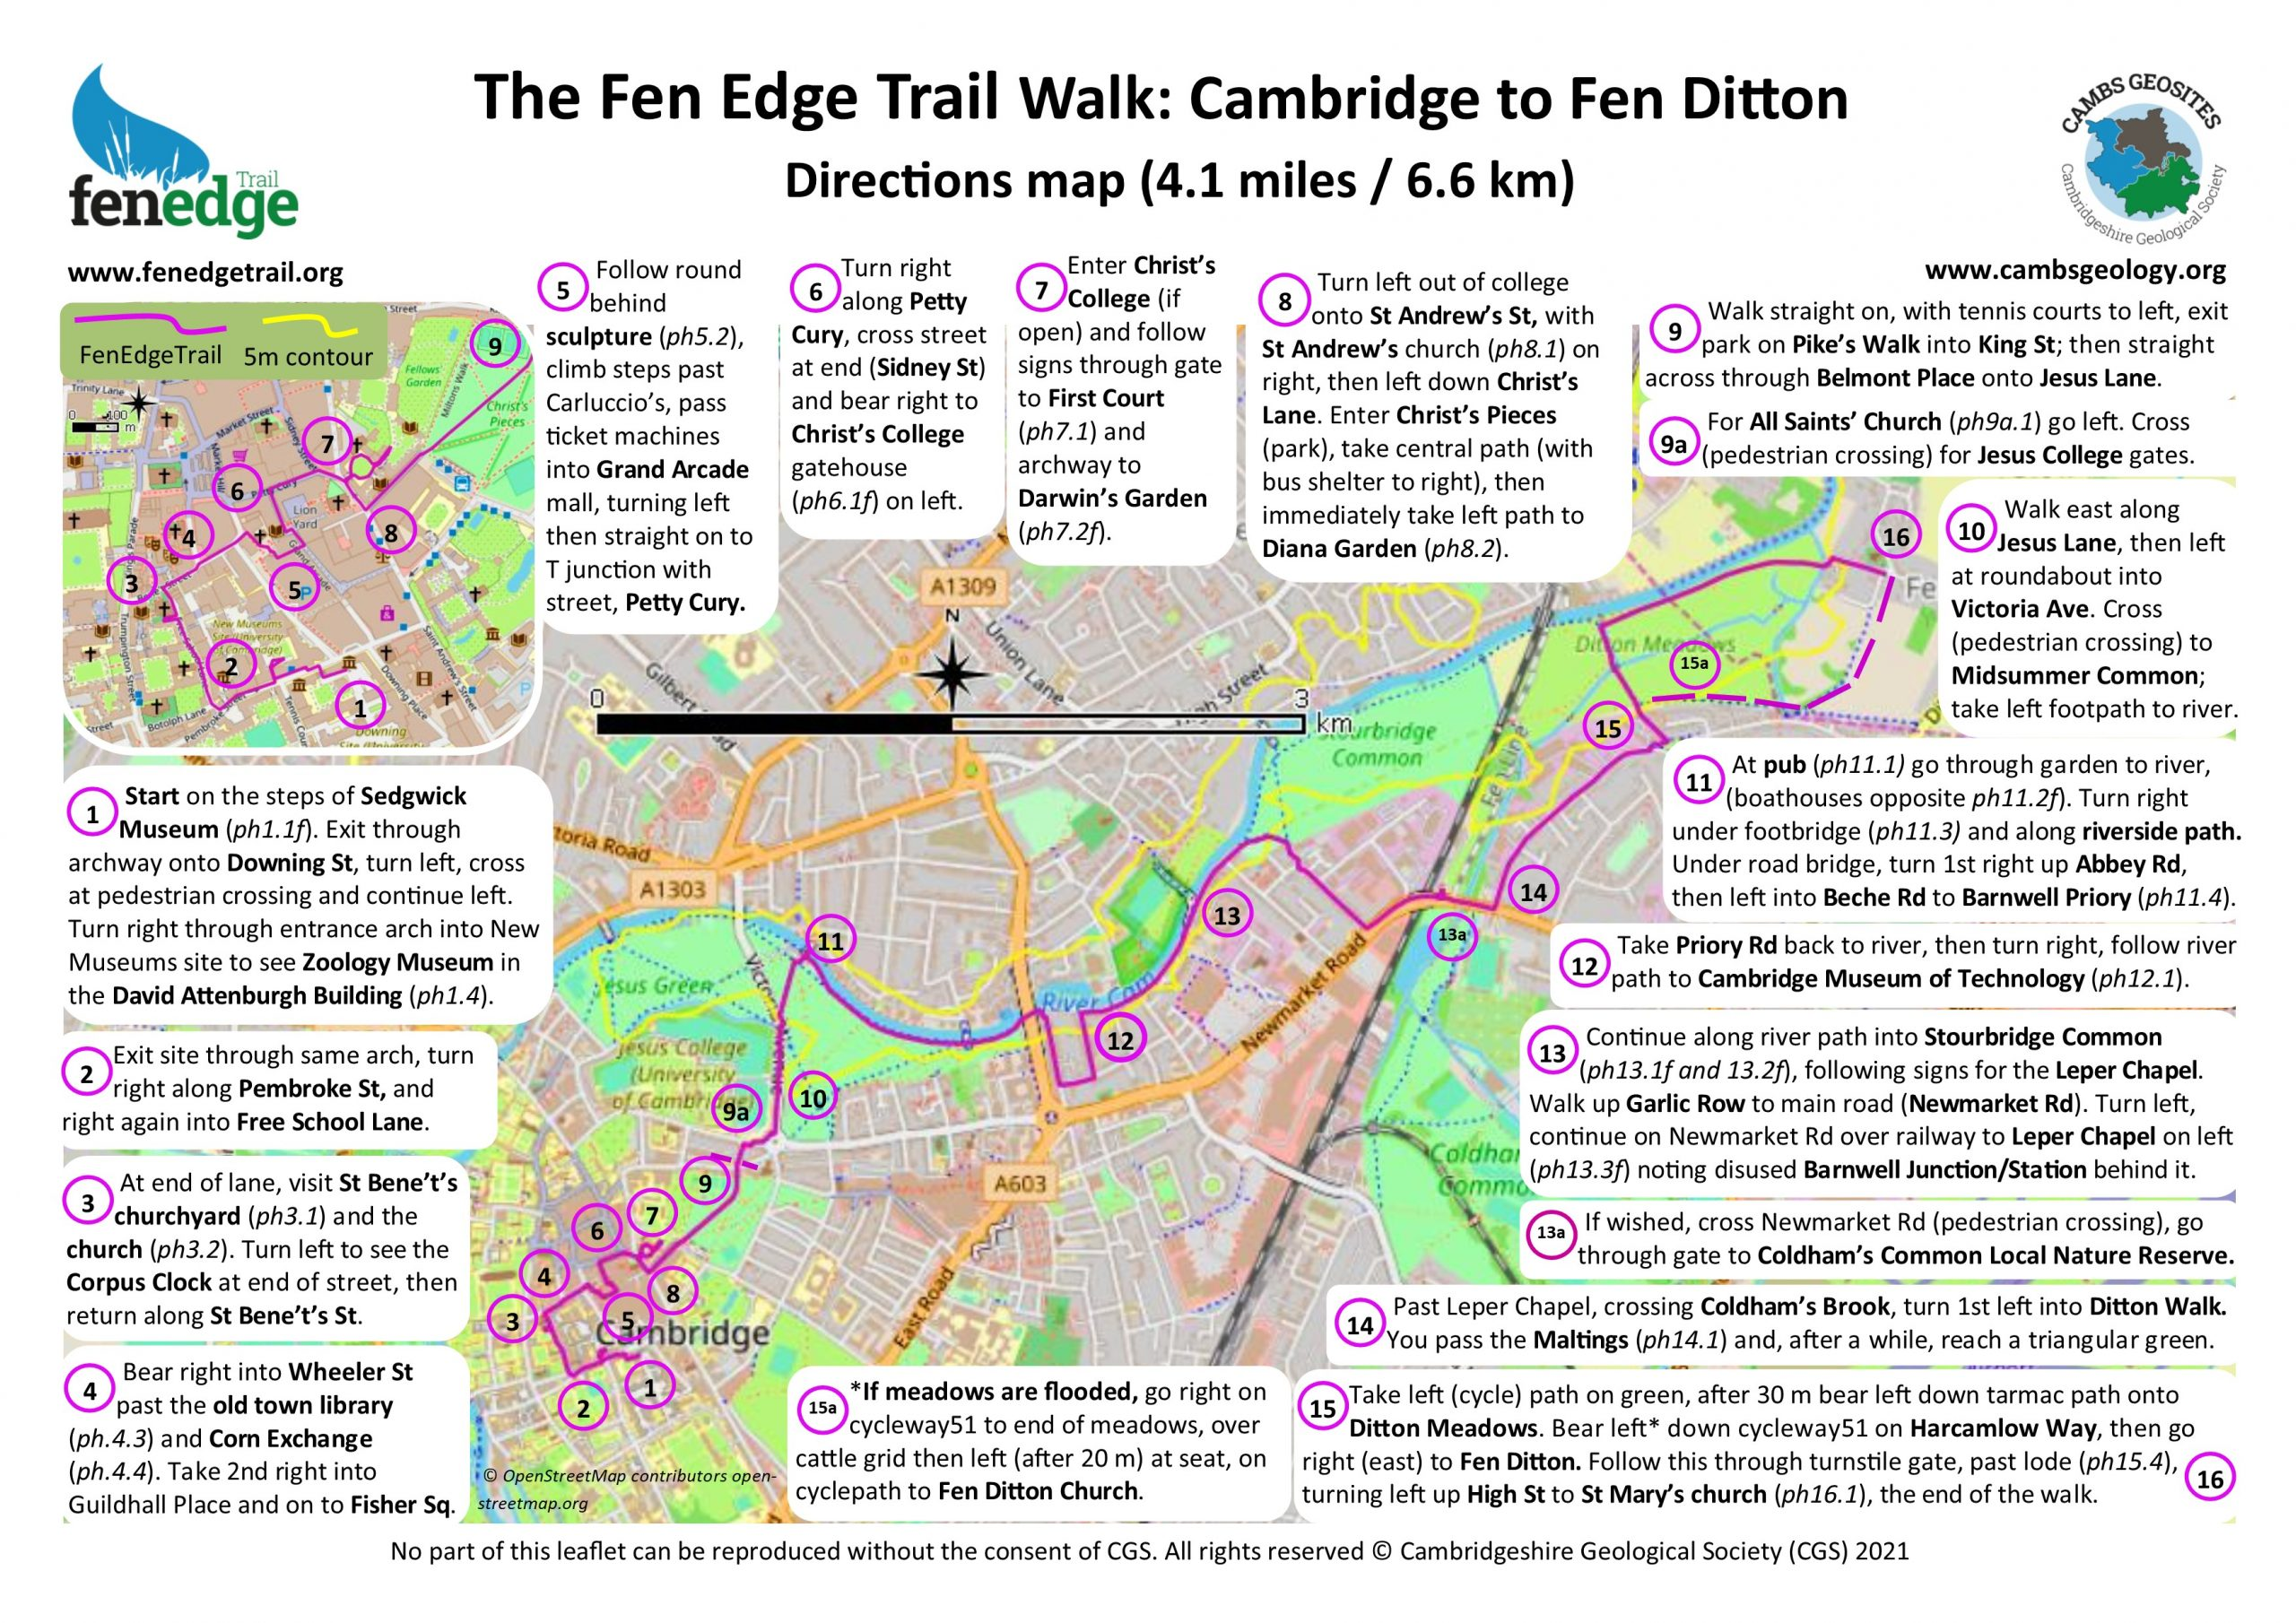 Cambridge to Fen Ditton map